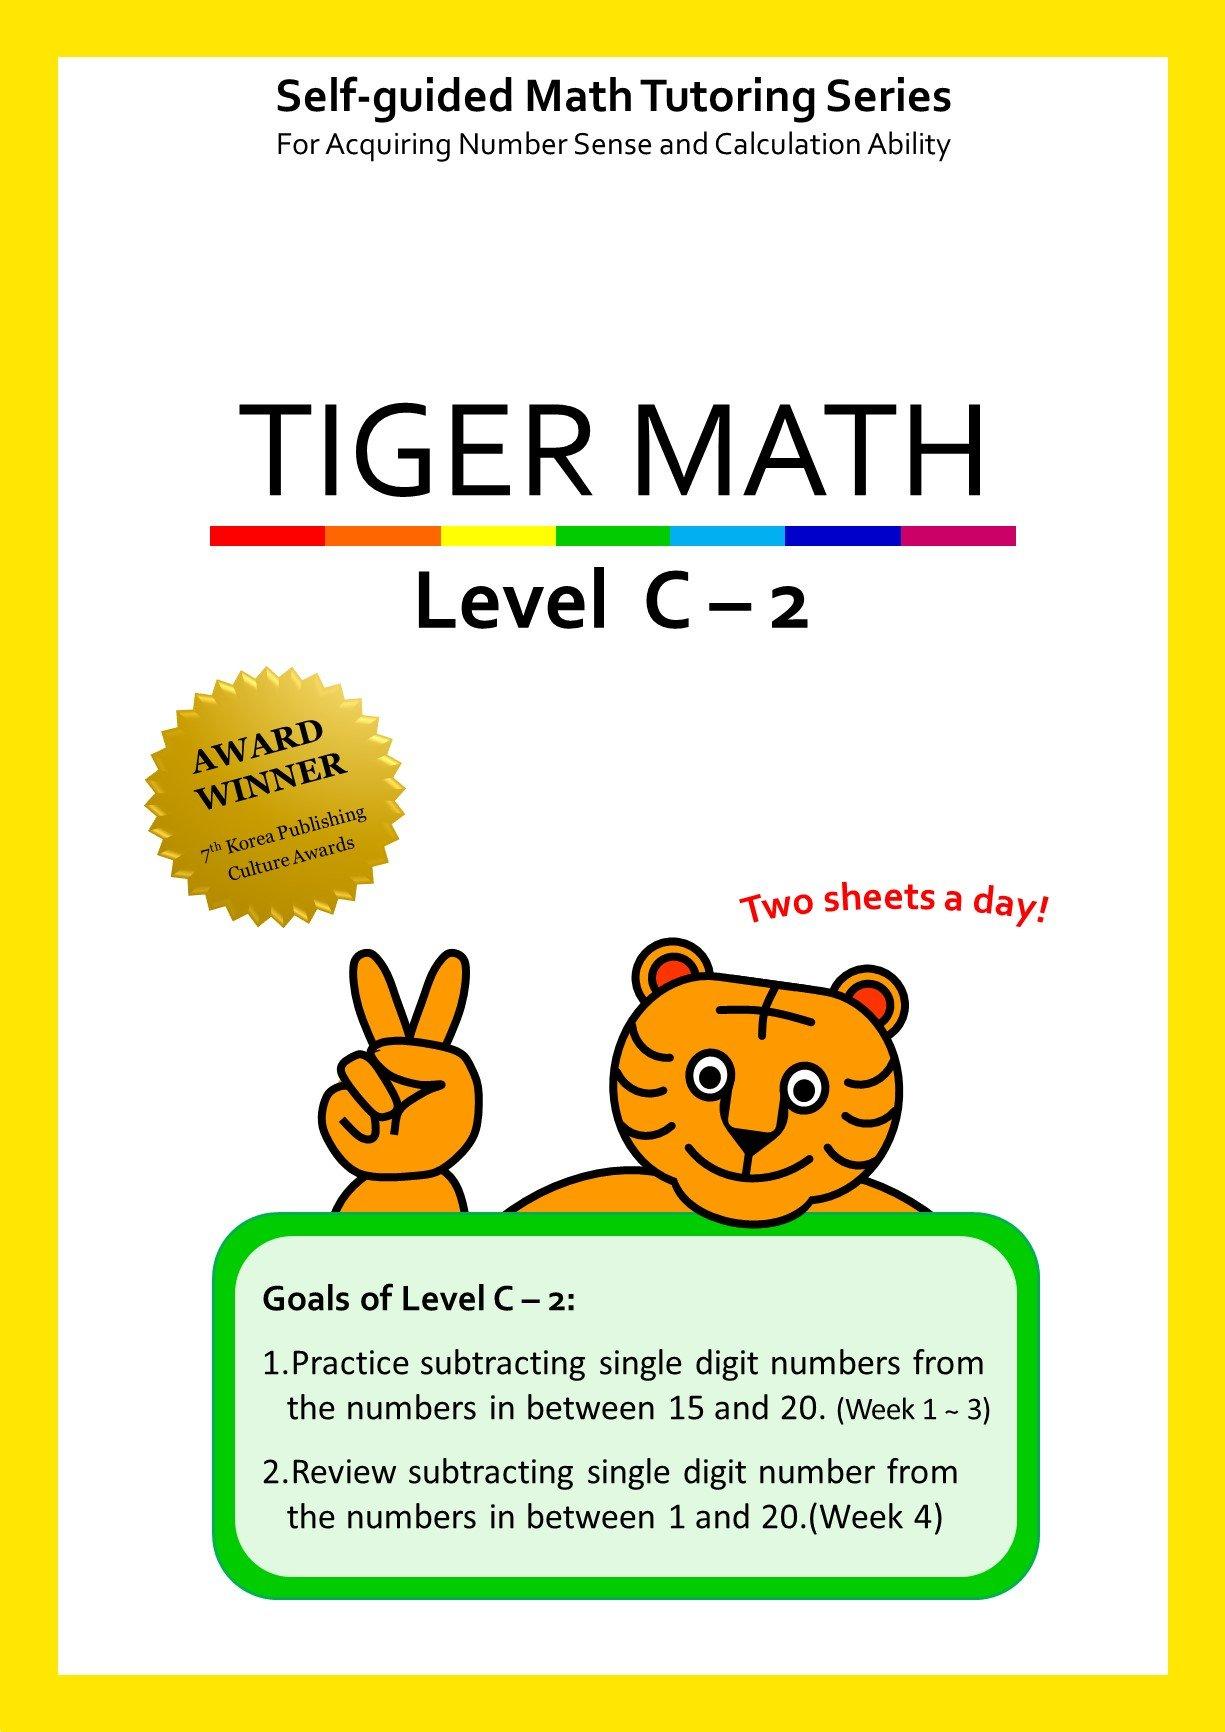 Tiger Math Level C - 2 for Grade 2 (Self-guided Math Tutoring Series - Elementary Math Workbook)